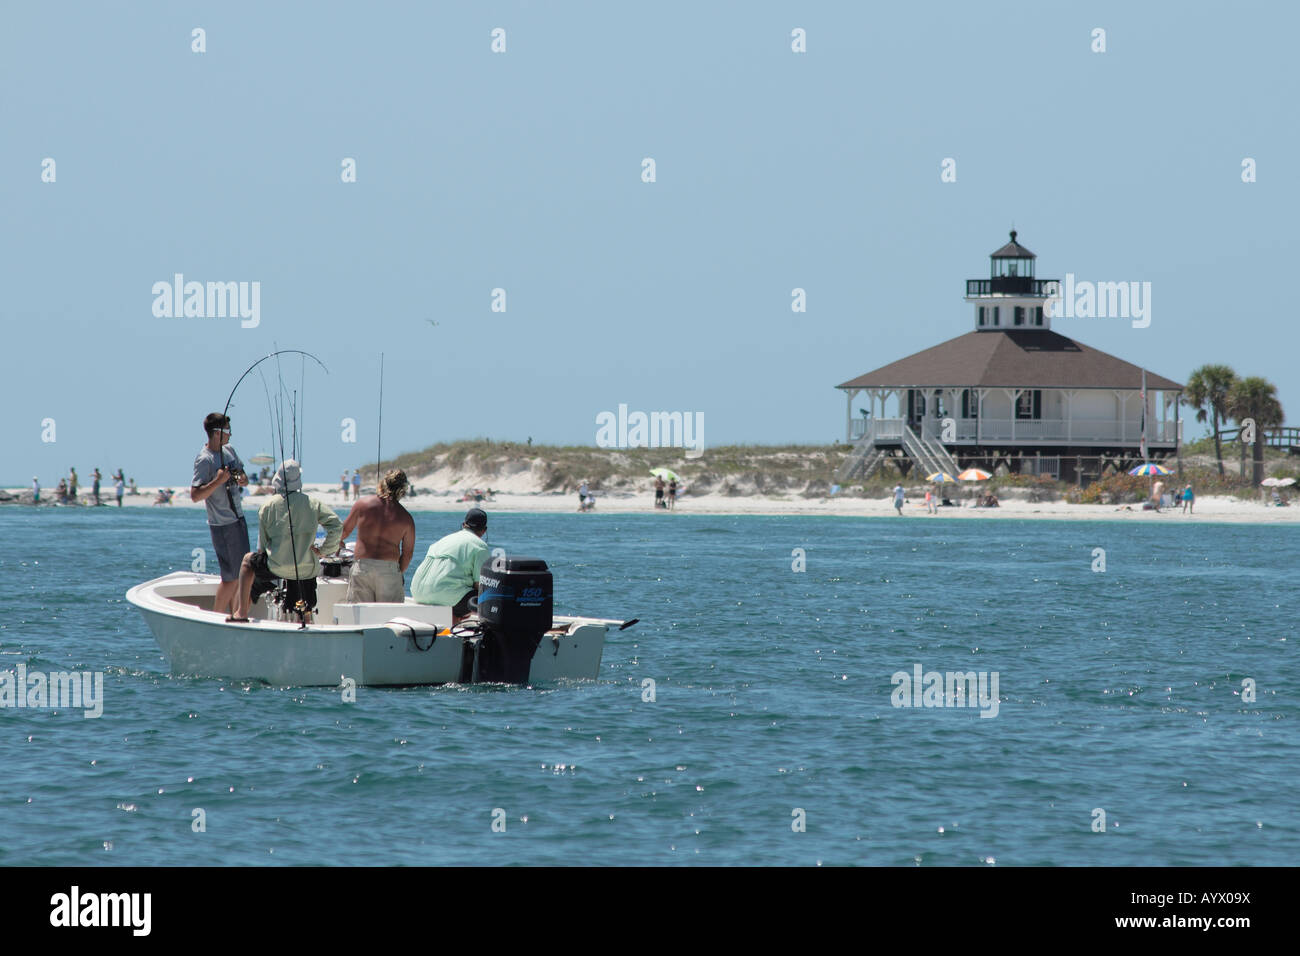 sportfishing for tarpon at famous Boca Grande, Florida, usa Stock Photo